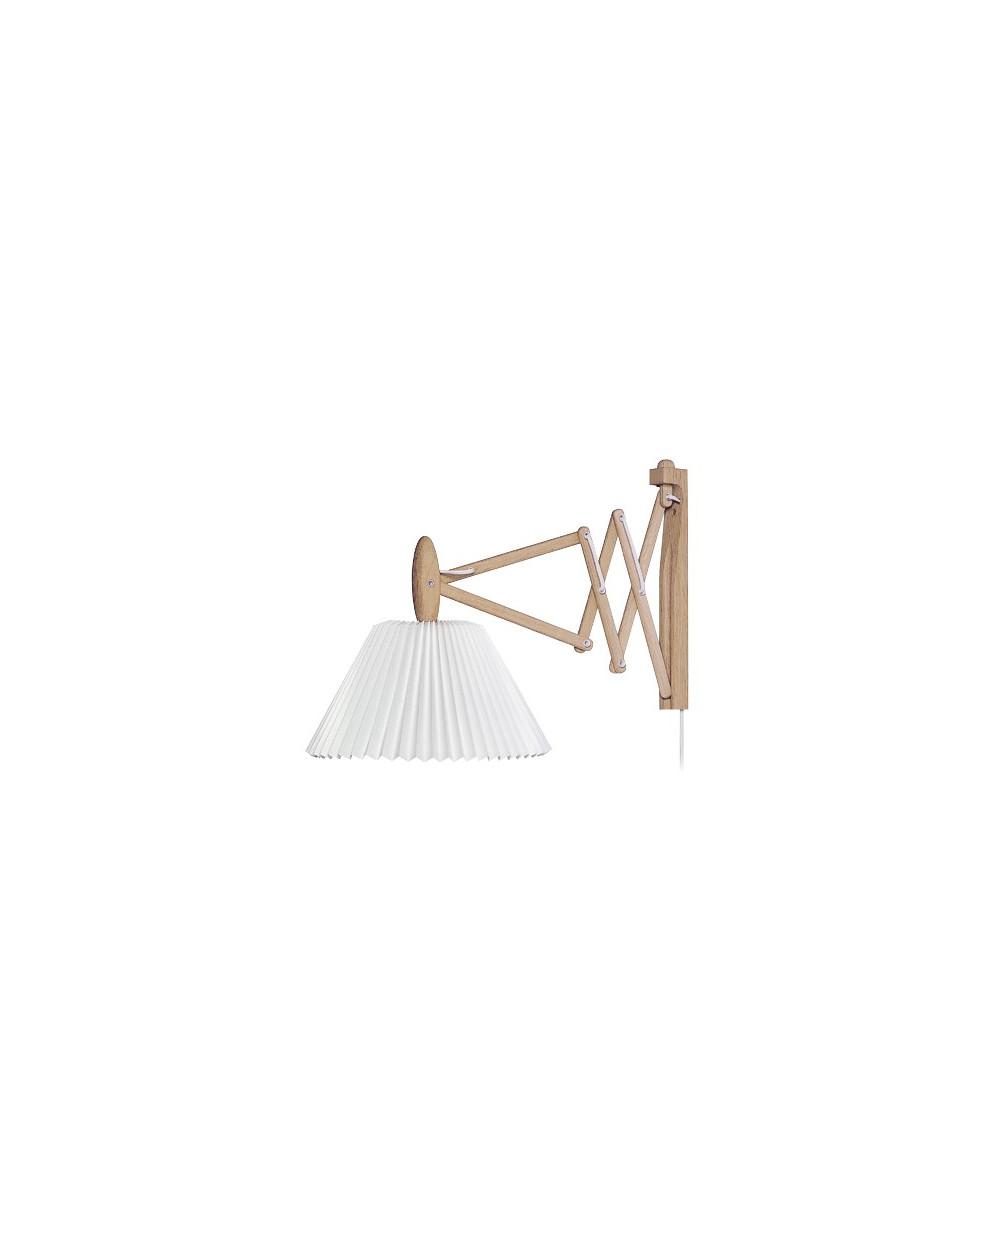 LAMPE MURALE LEKLINT